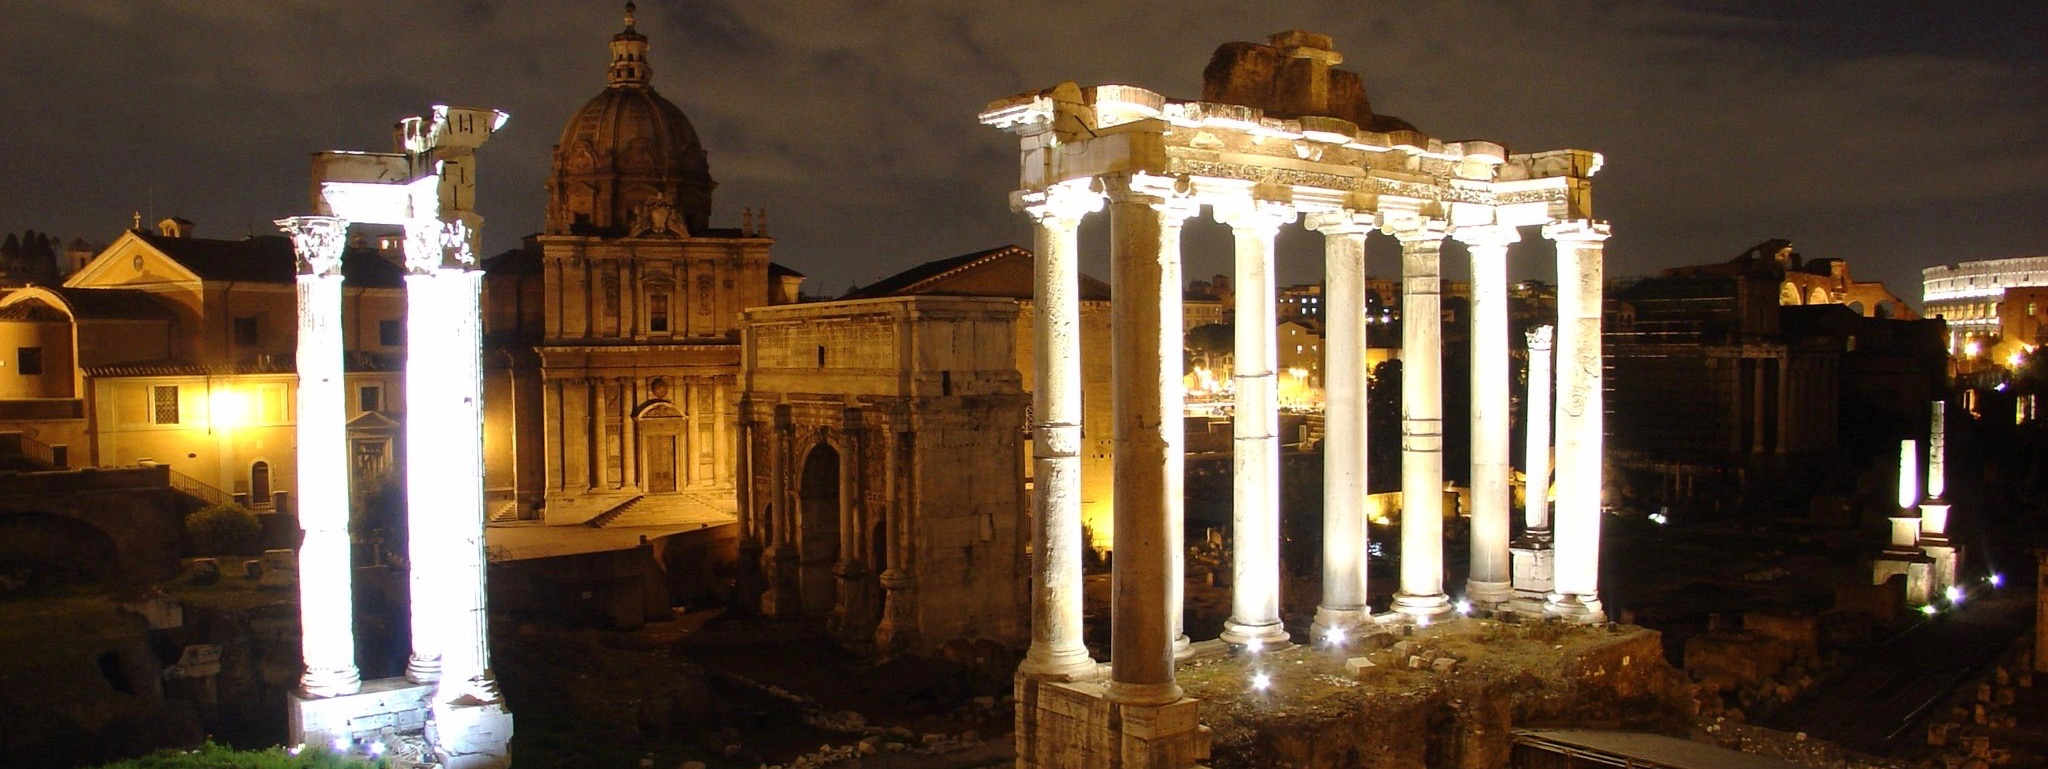 #5 Spragg Rome forum.jpg